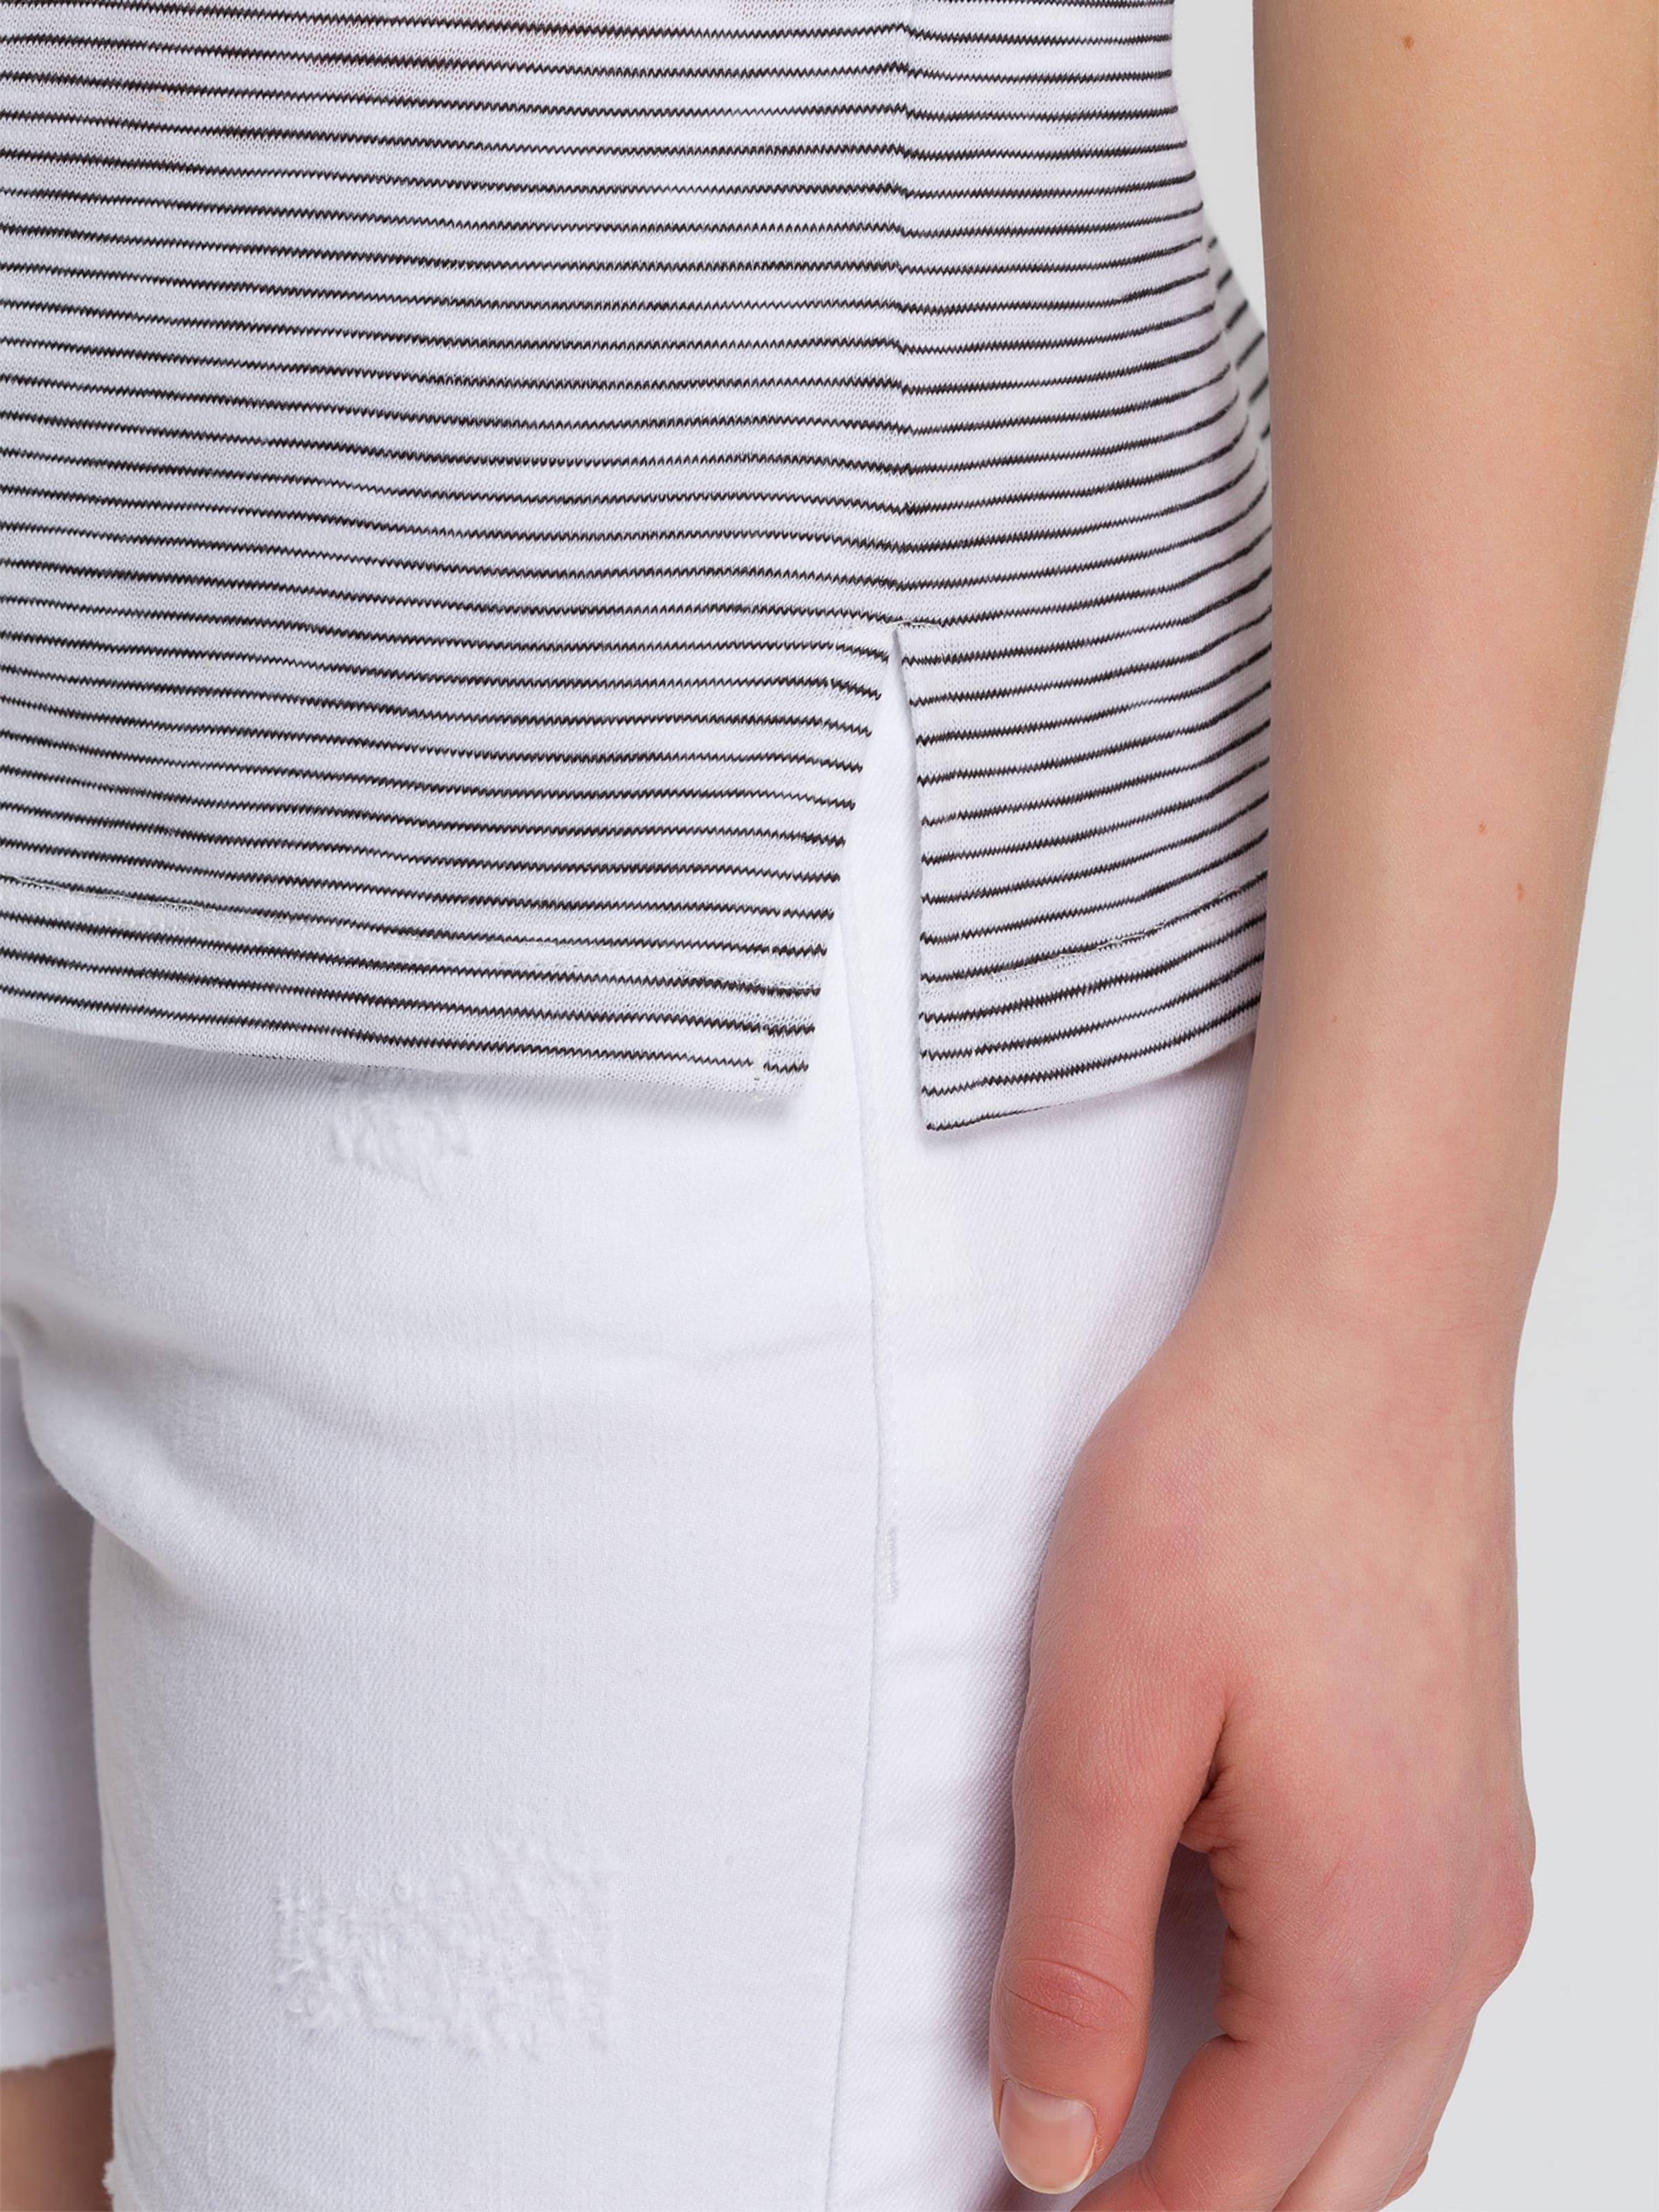 ' In Shirt BlauWeiß 55380 Jeans Cross 5jqL4RA3